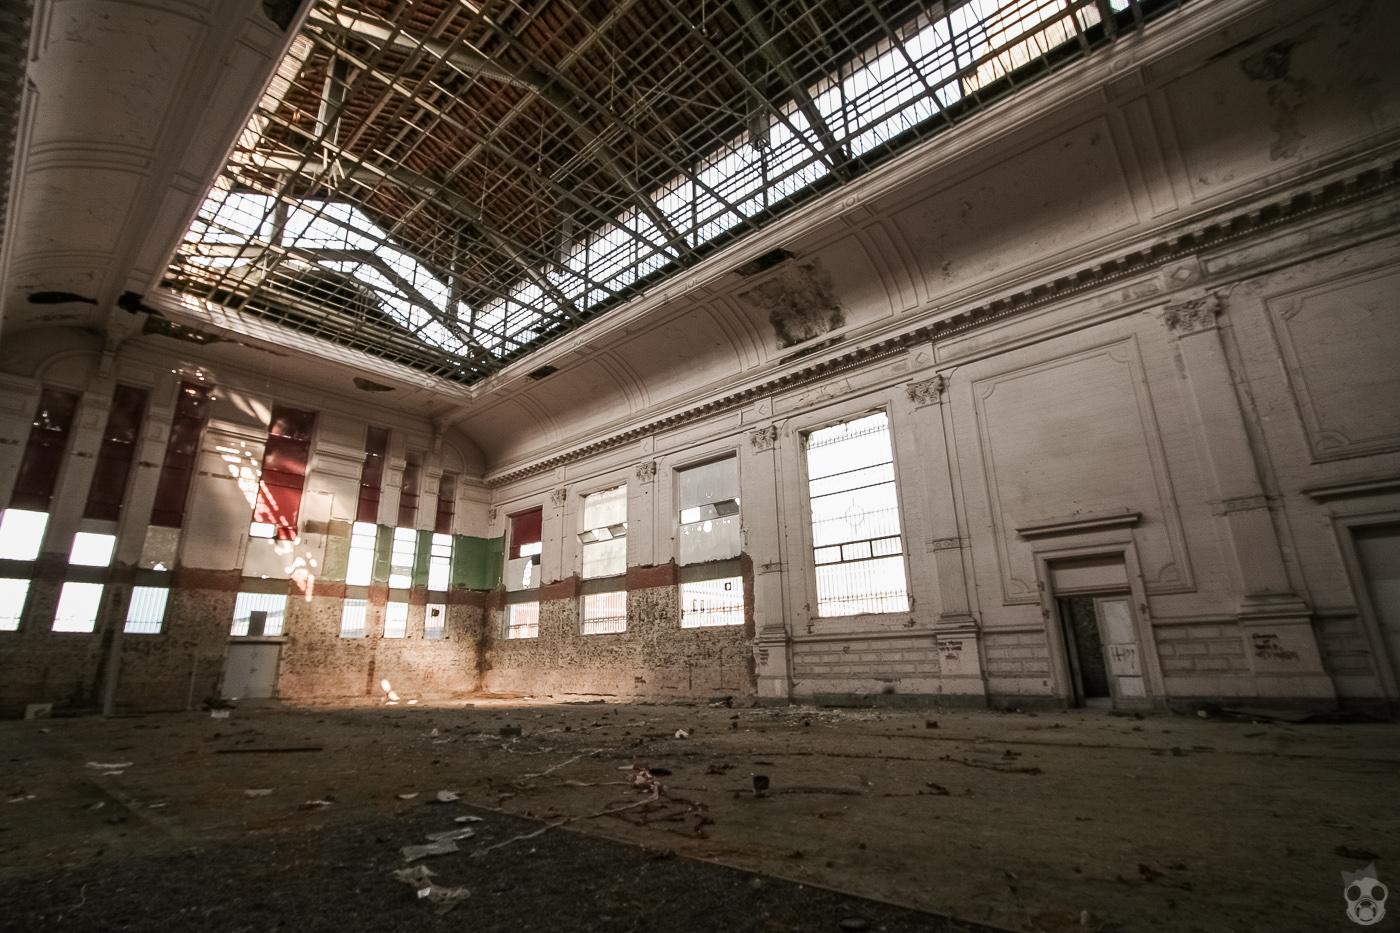 Brussels Cargo Train Station  ブリュッセル貨物駅